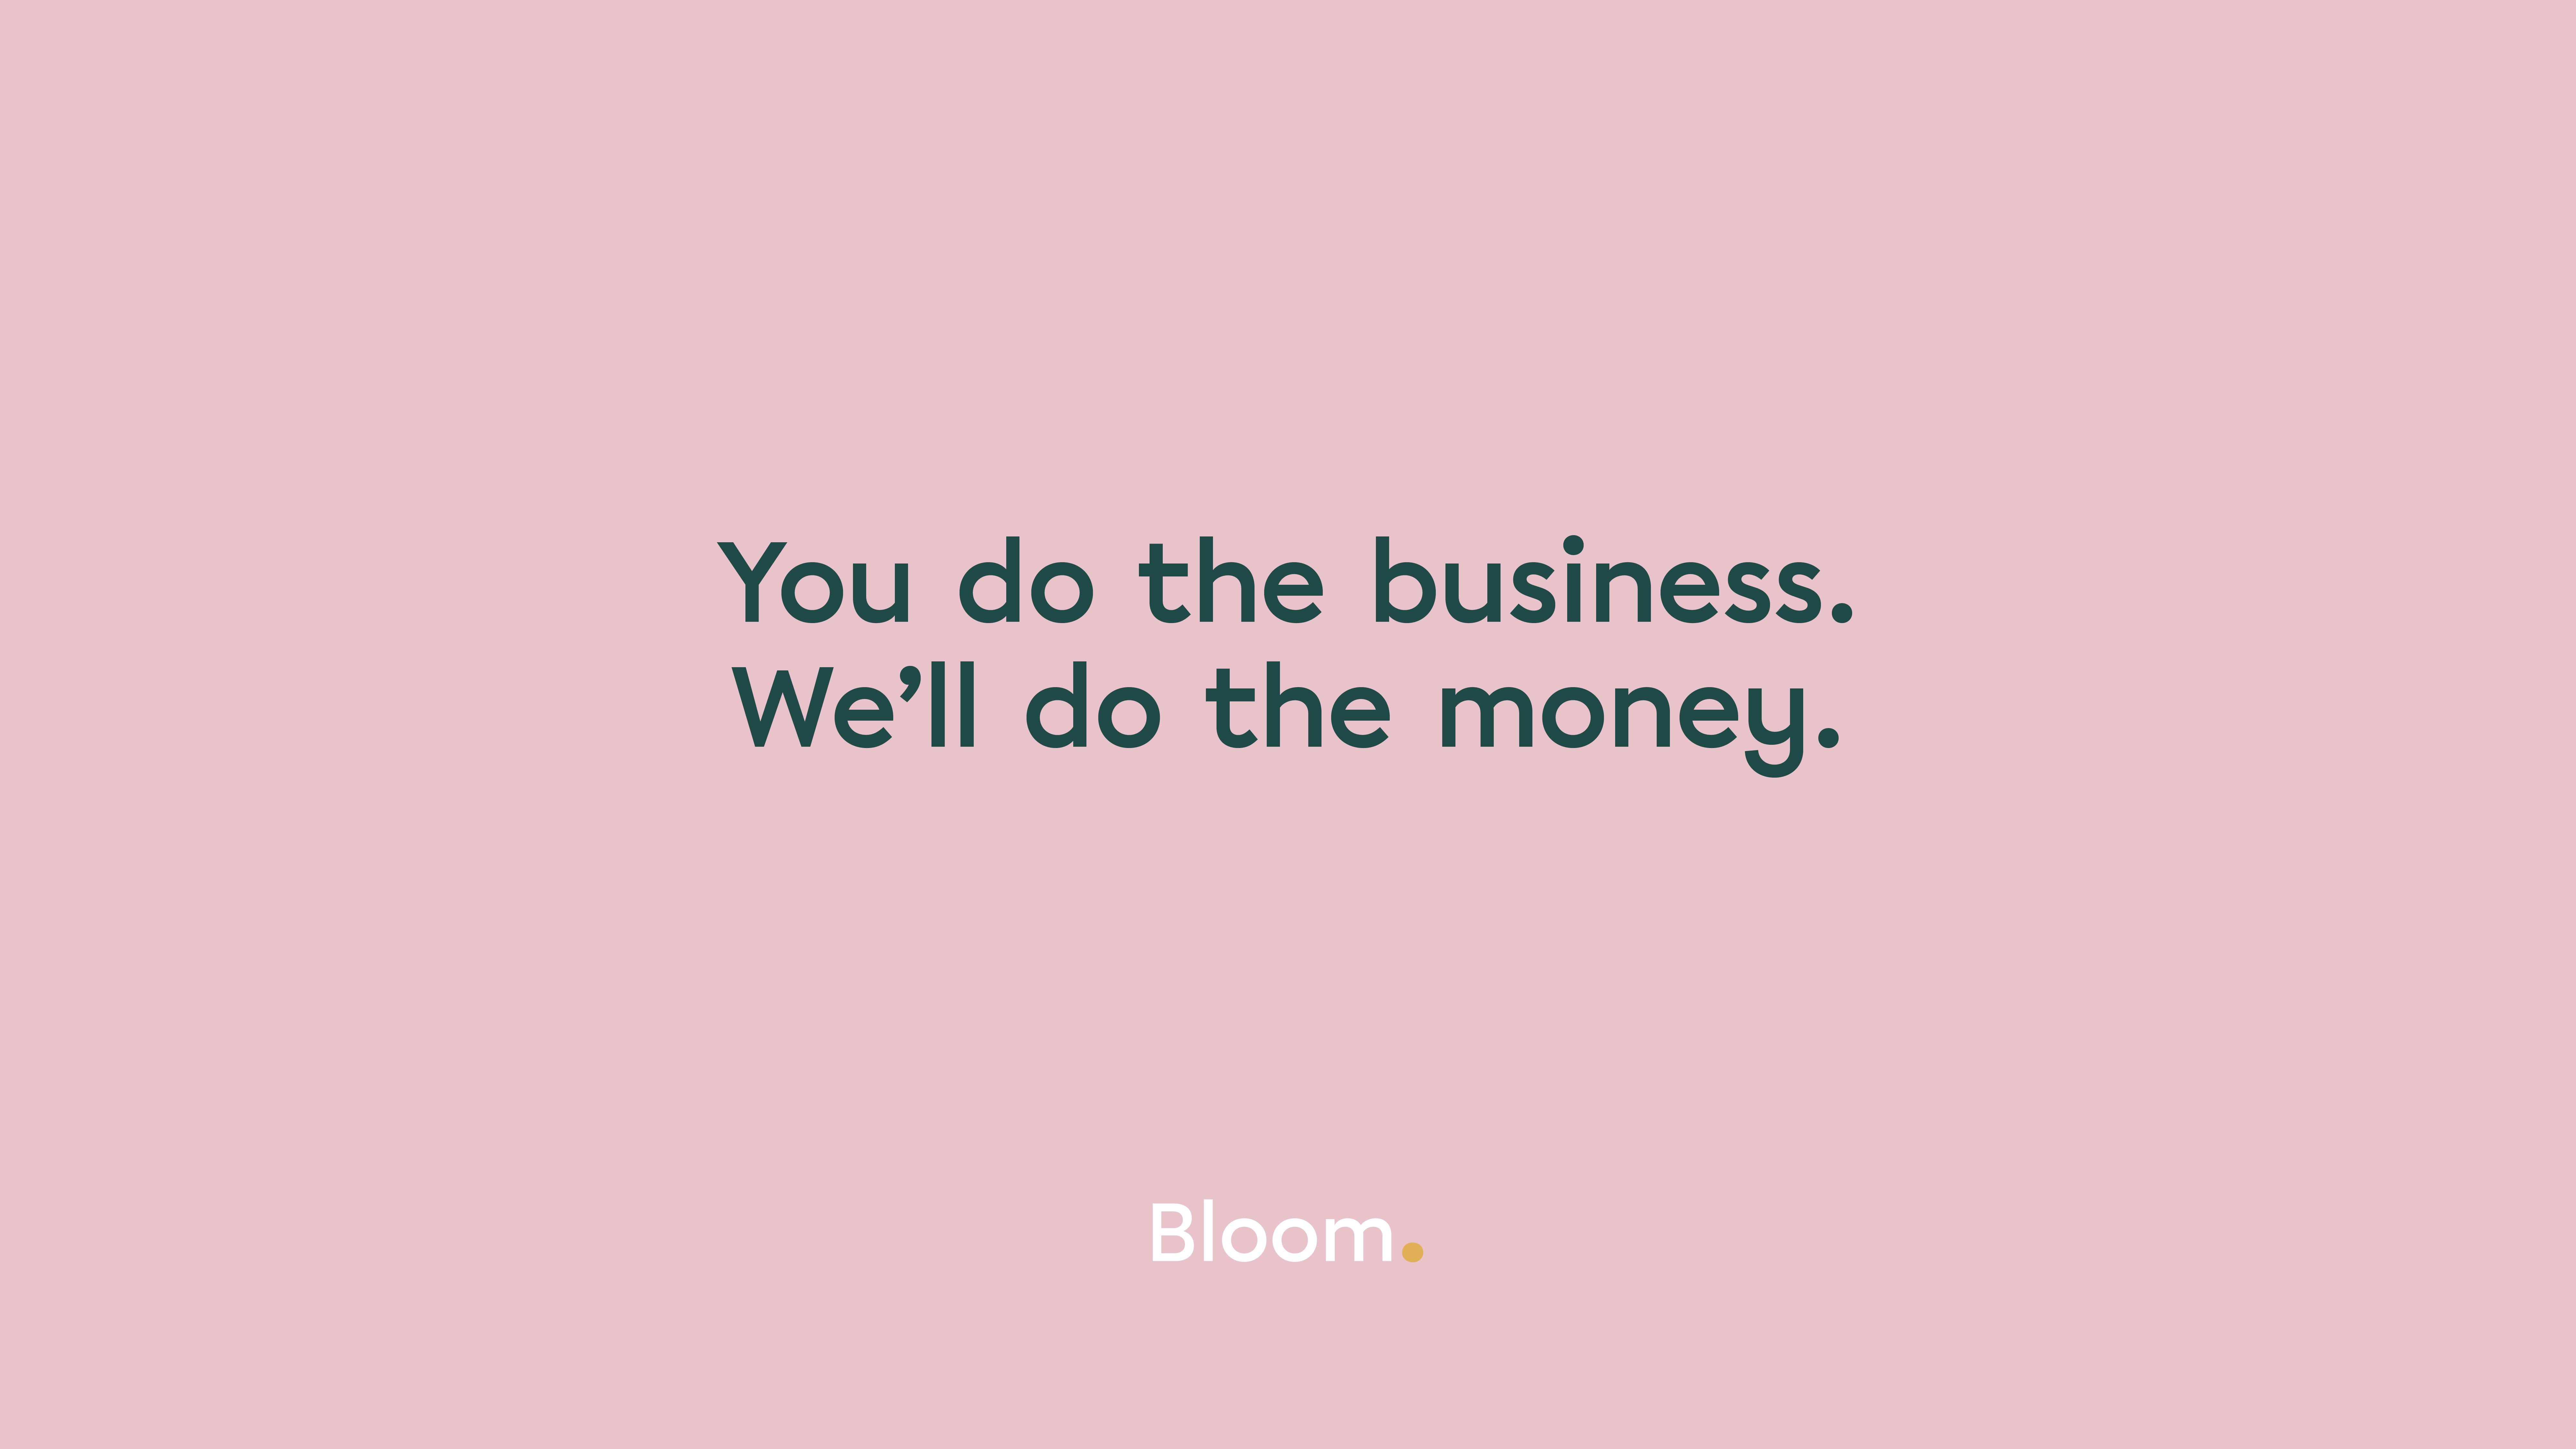 Bloom-Behance-Tagline-By-Sunday